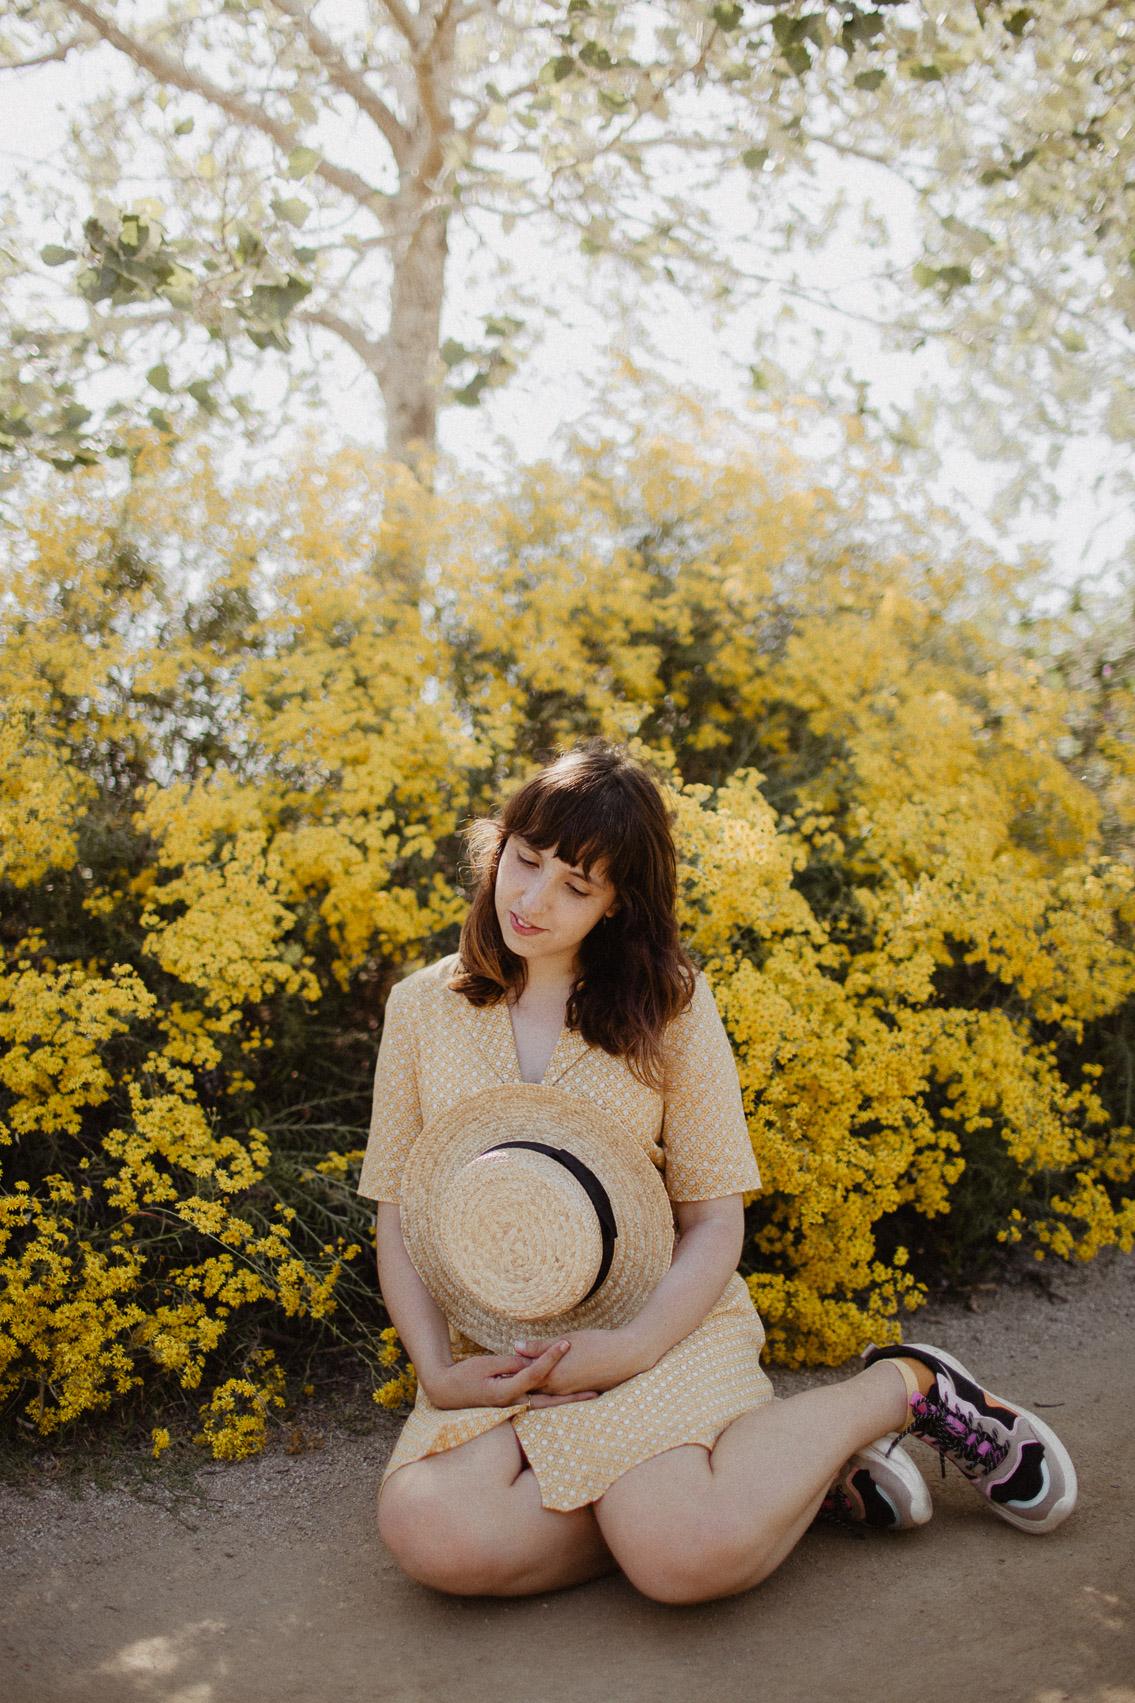 Delta del Llobregat yellow outfit - The cat, you and us